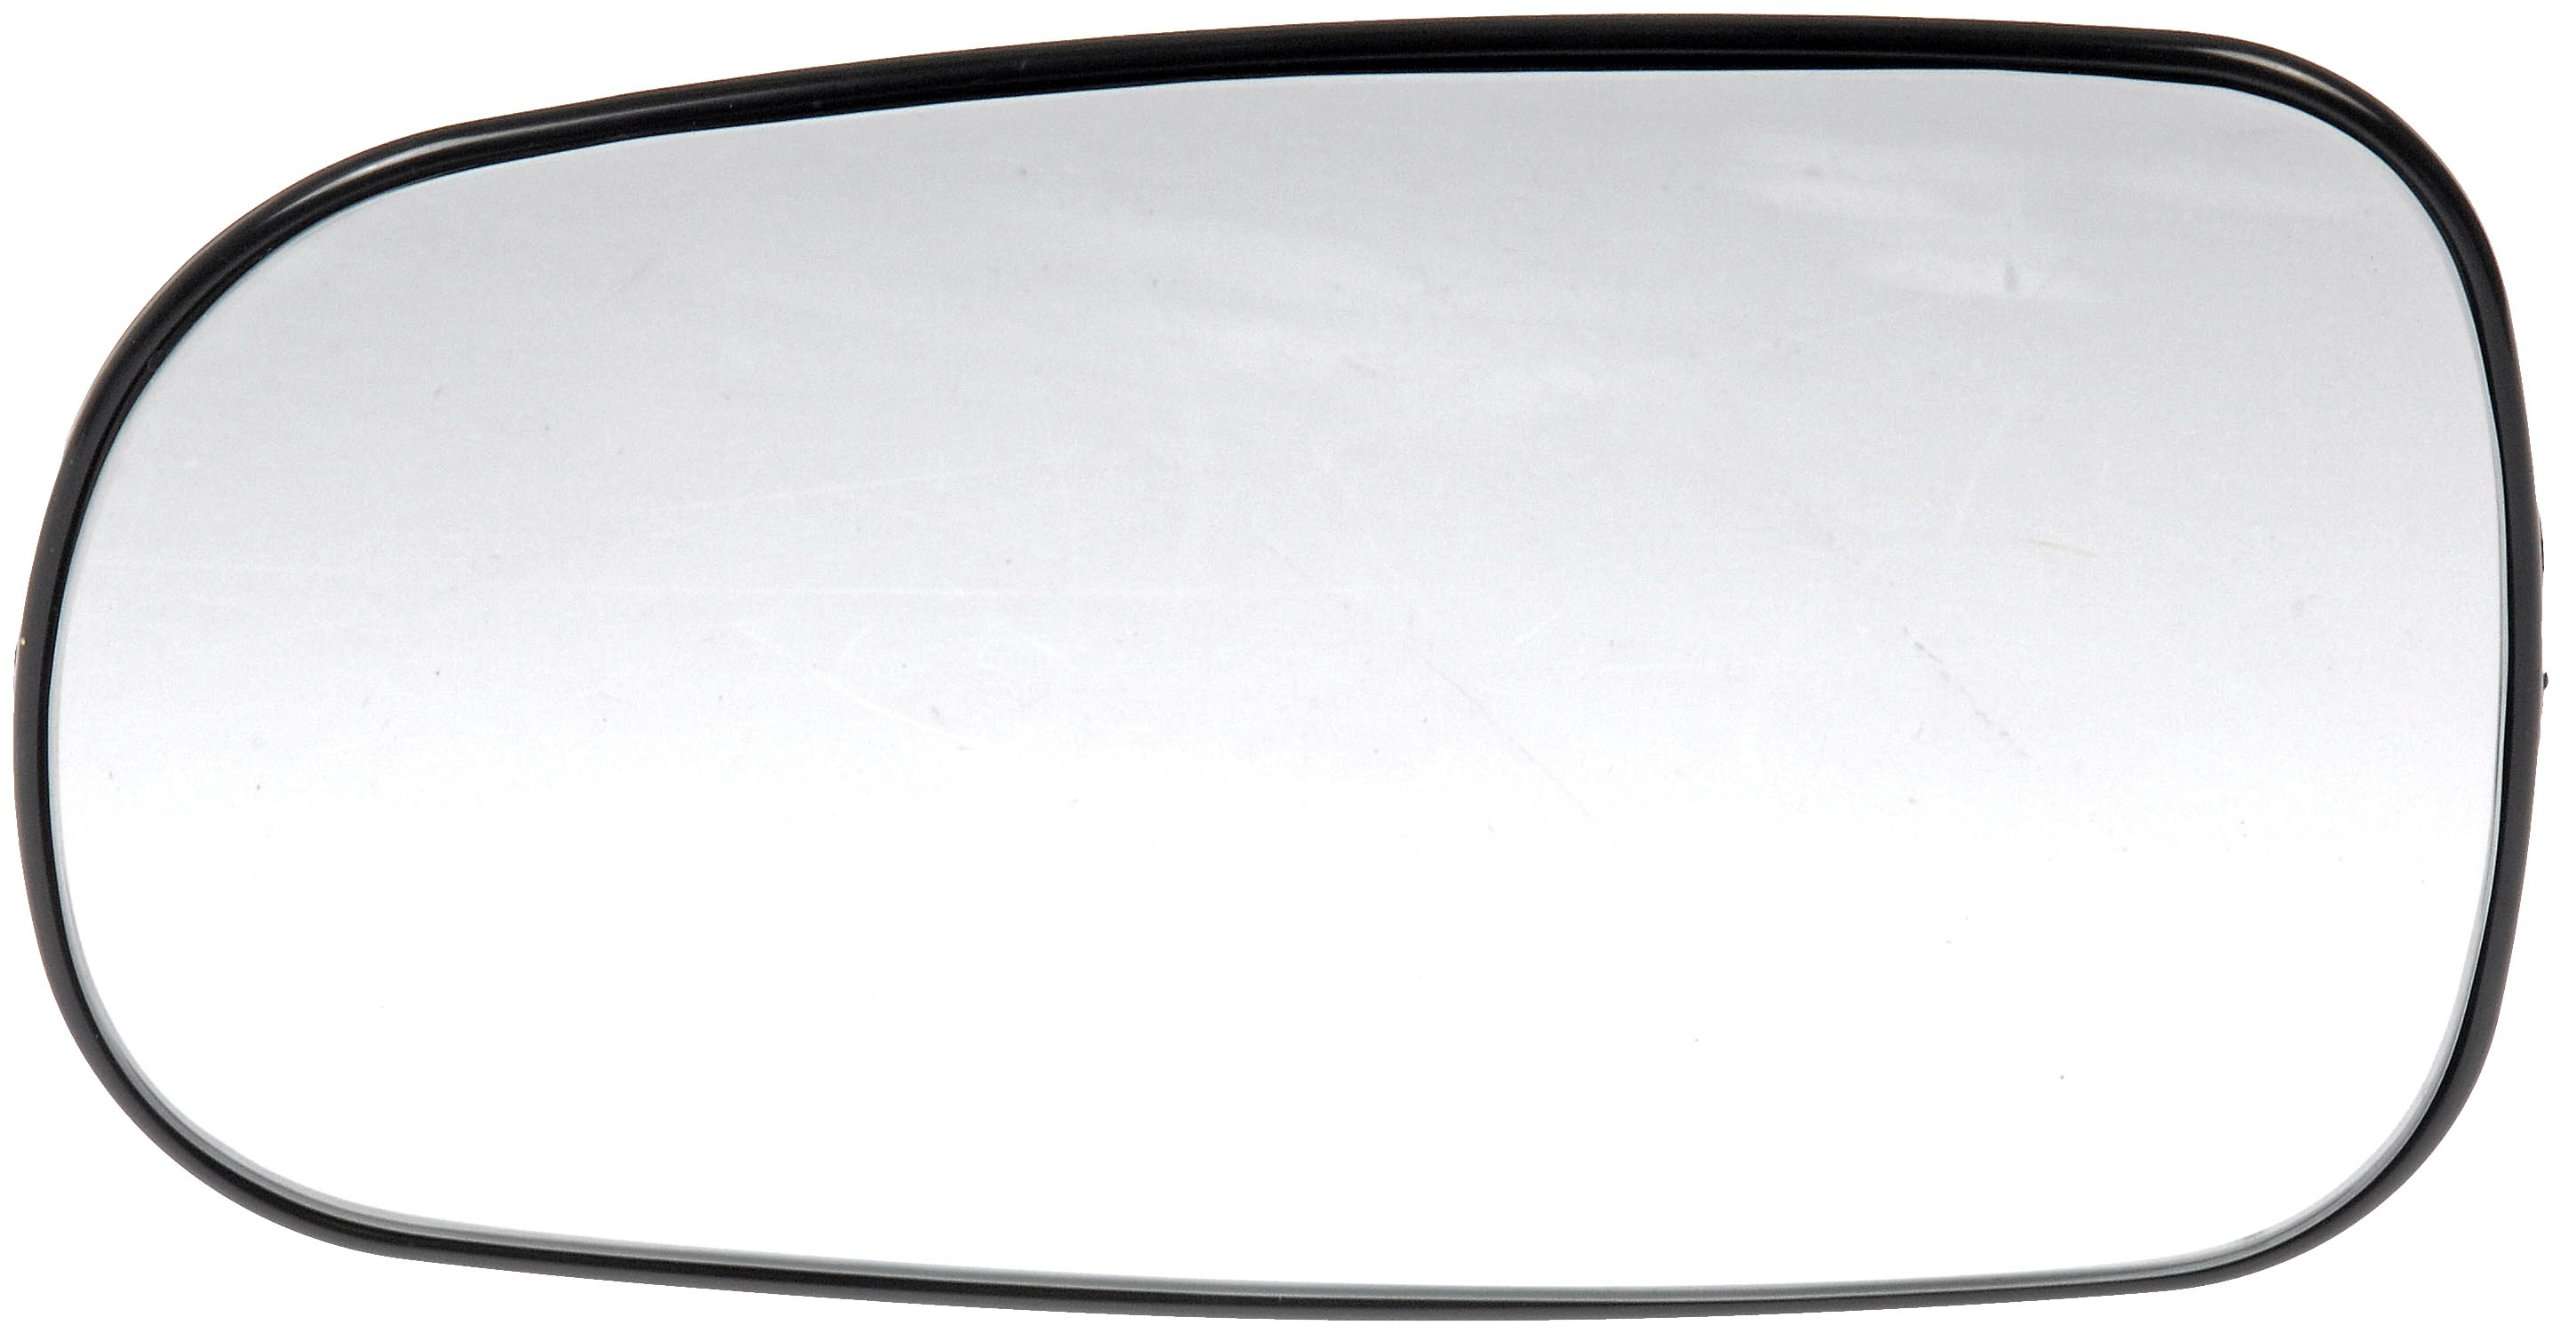 Dorman 56708 Saab 9-3 Driver Side, Non-Heated, Plastic Backed Door Mirror Glass